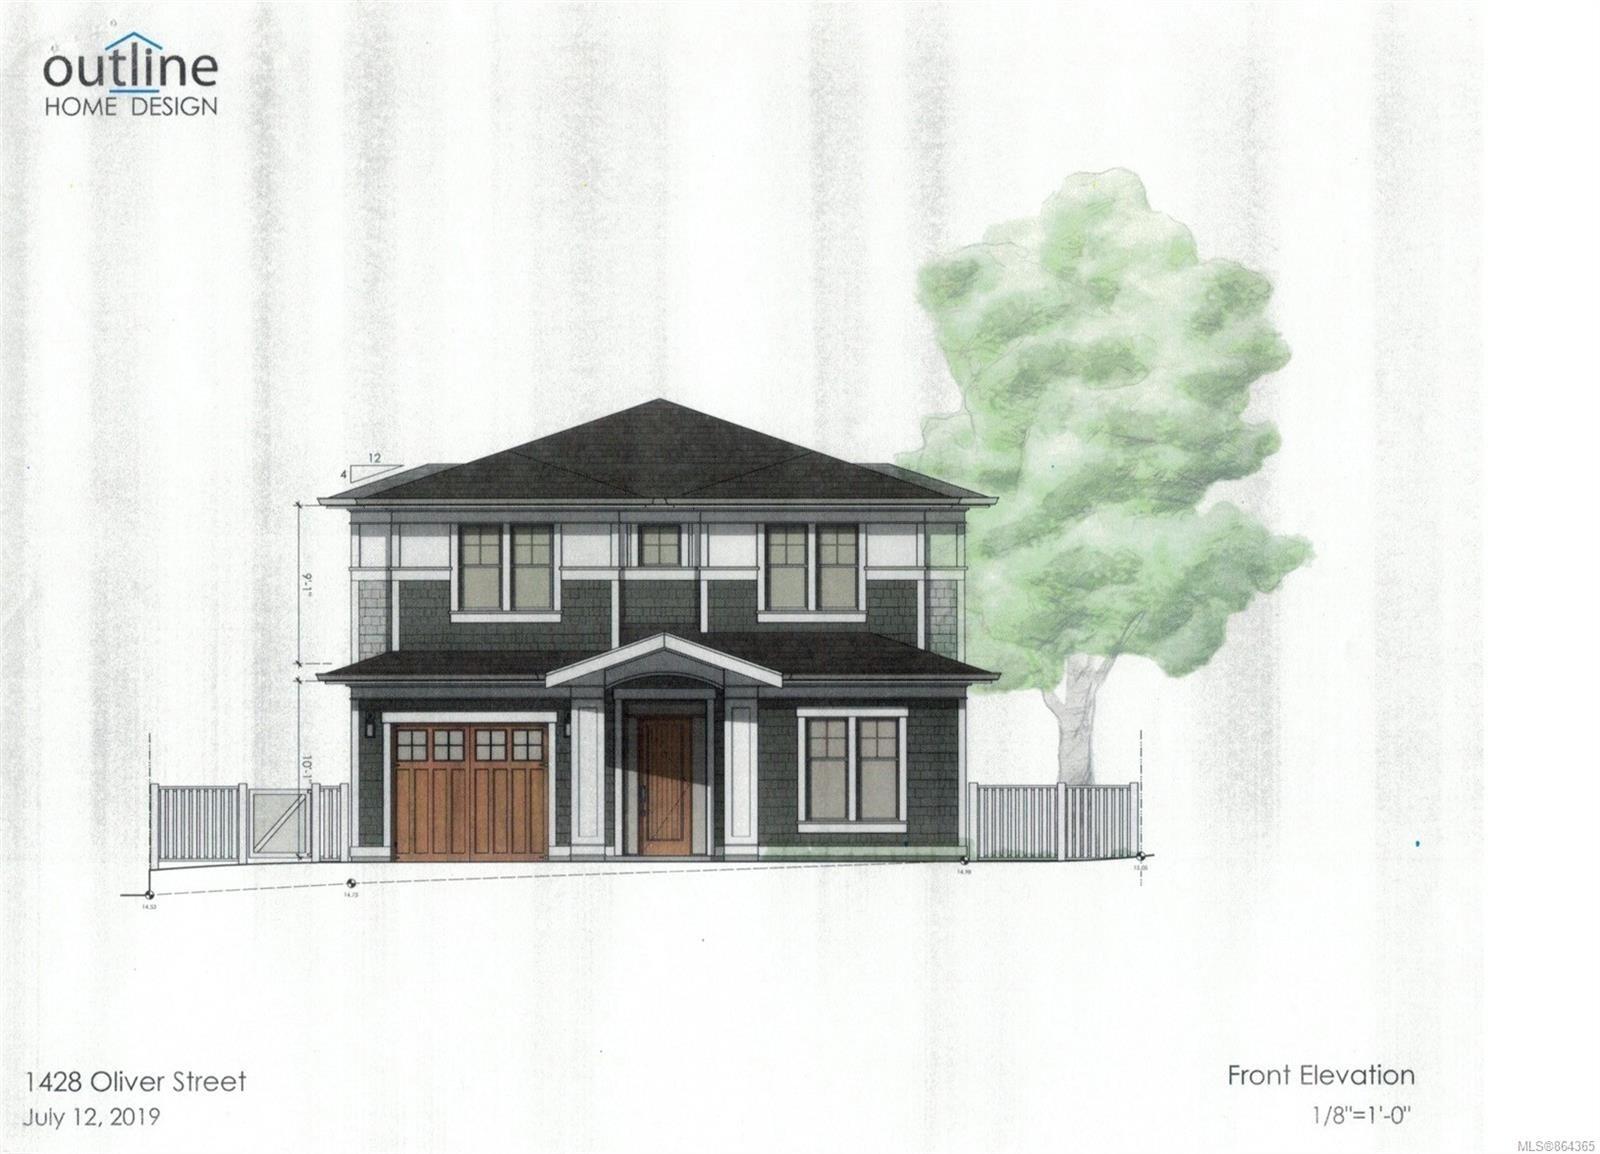 Main Photo: 1428 Oliver St in : OB South Oak Bay House for sale (Oak Bay)  : MLS®# 864365